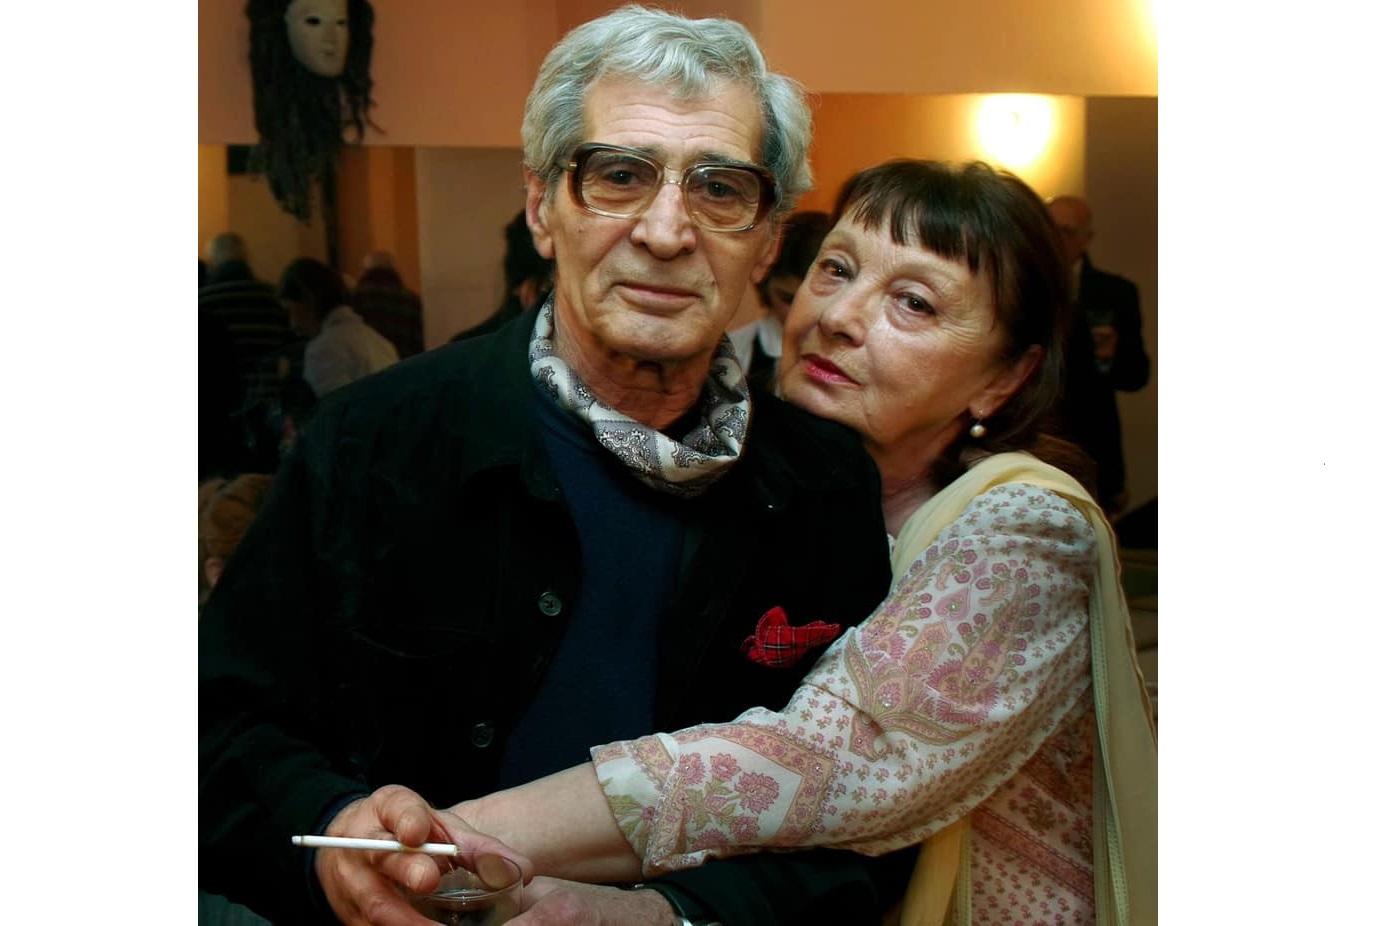 Photo of რეჟისორი სანდრო მრევლიშვილი და მისი მეუღლე ერთ დღეს, 10 წუთის ინტერვალით გარდაიცვალნენ